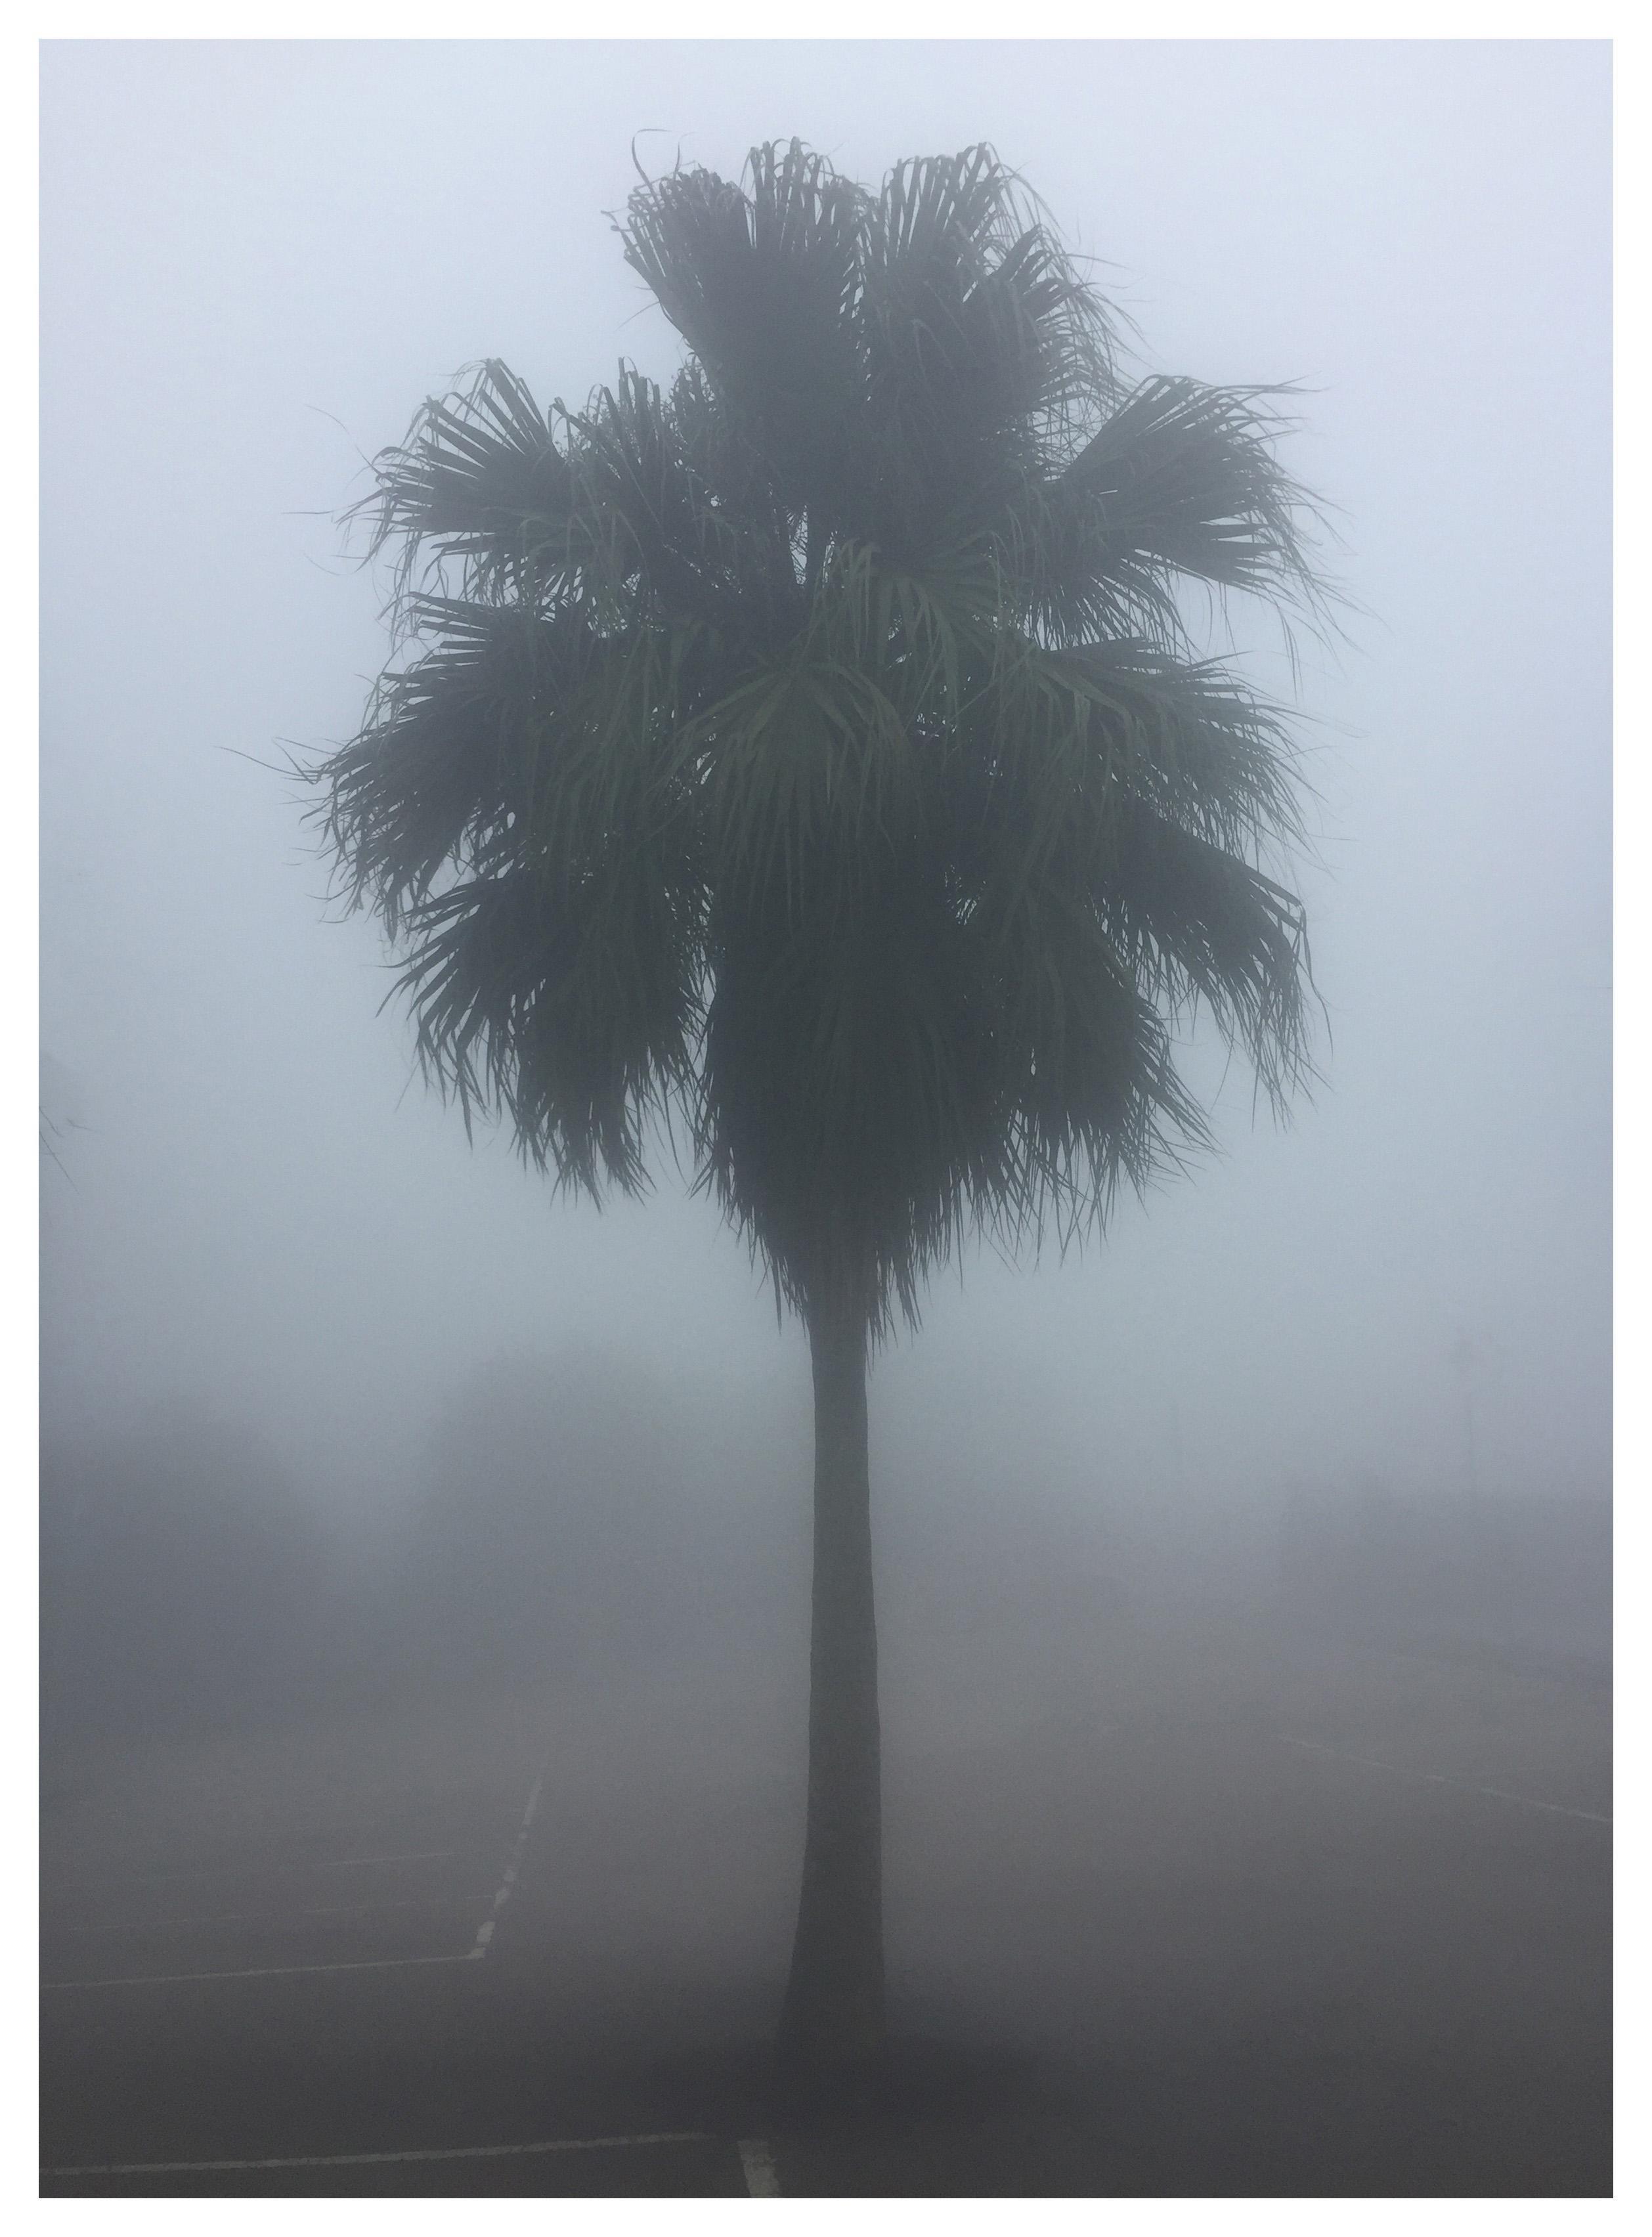 The Peak Palm Tree, Hong Kong - Palm print color photography